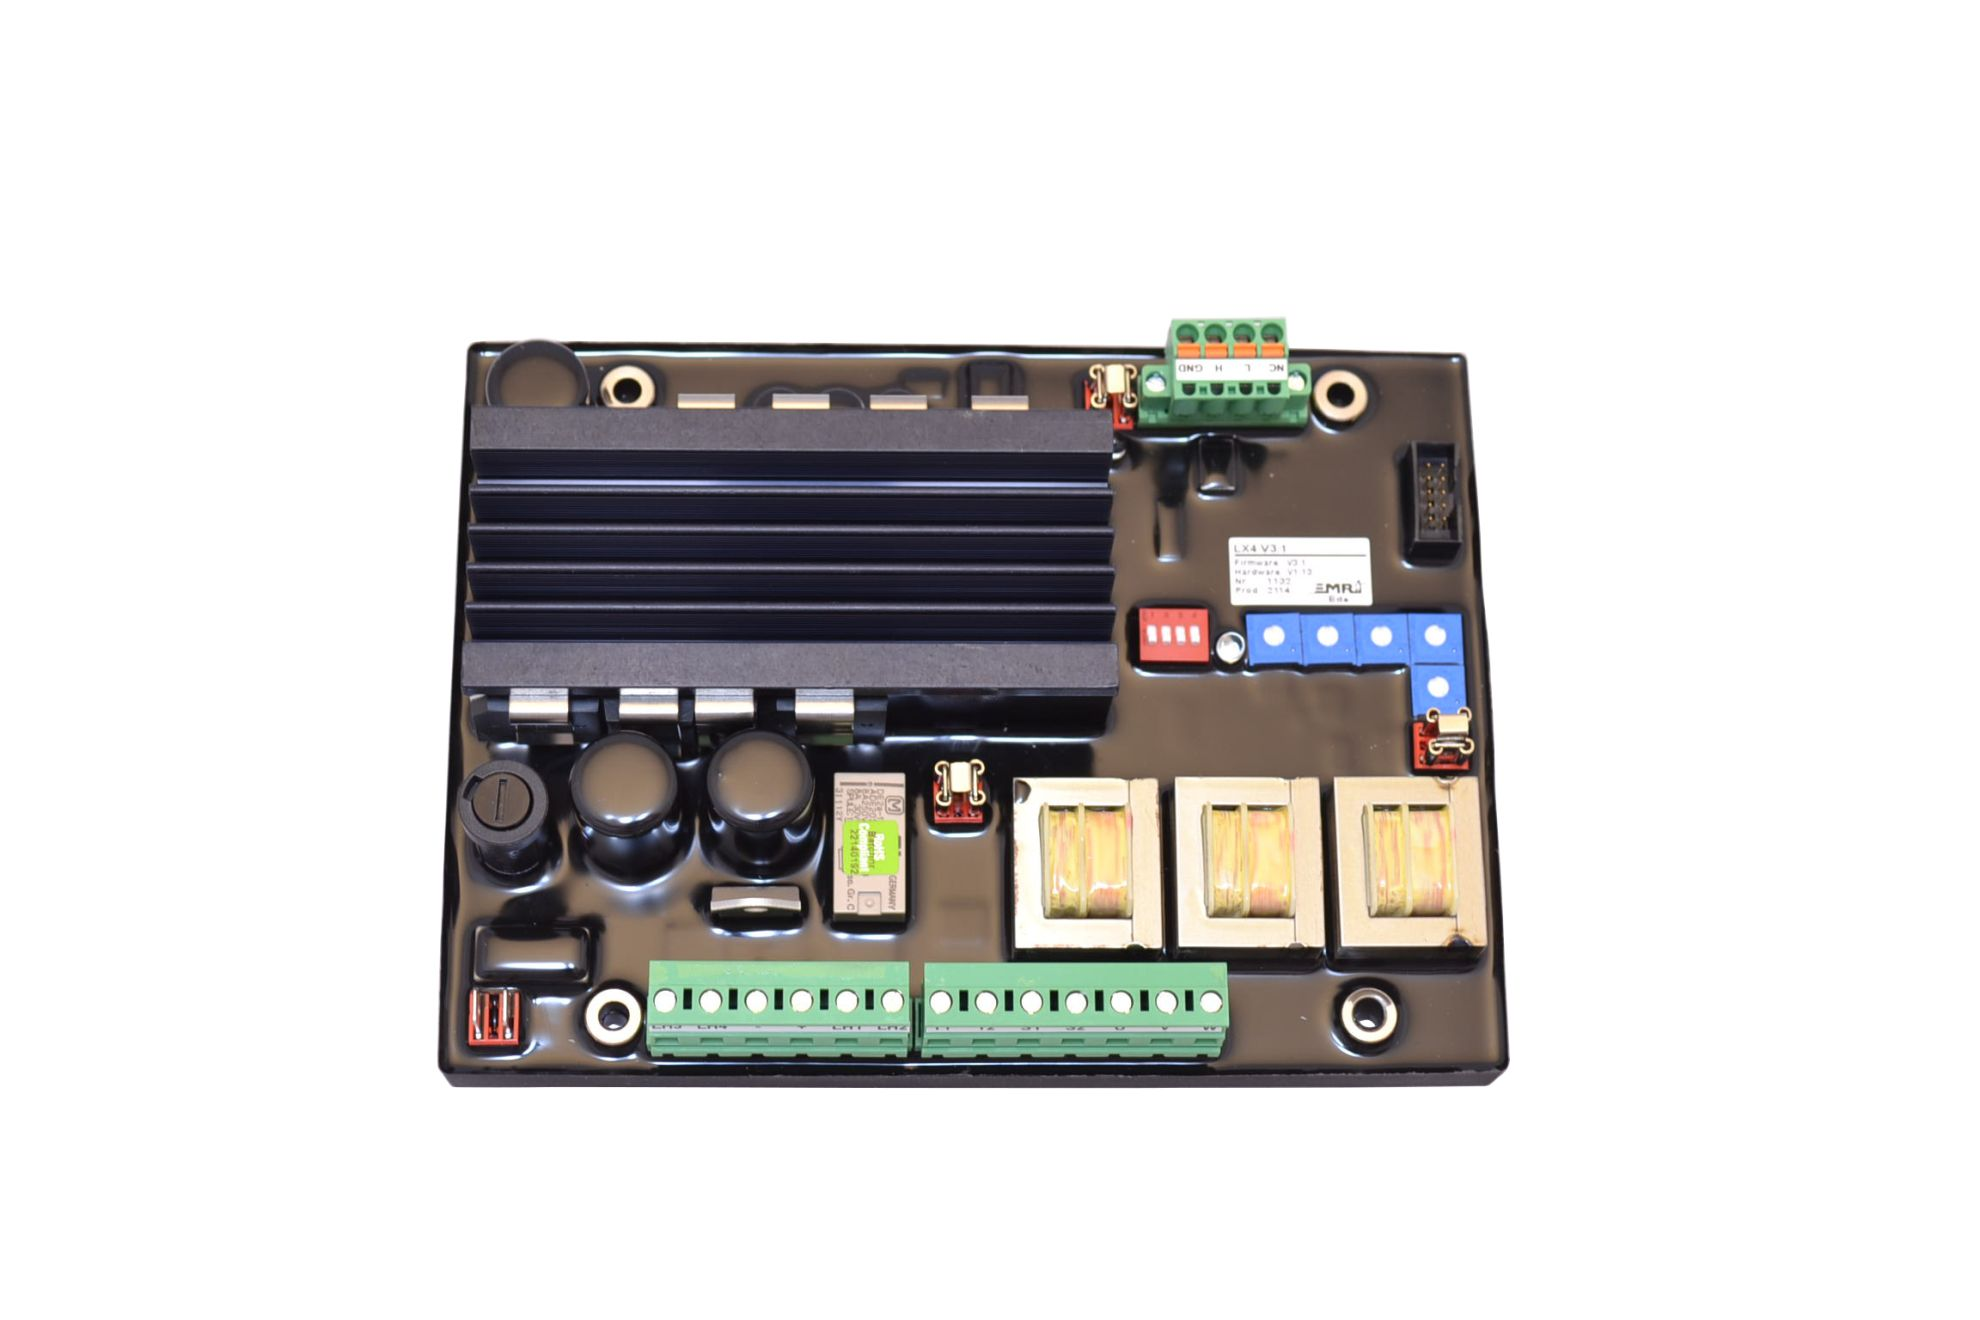 EMRI LX4 V3 400 Hz - EMRI Voltage regulators   EMRI  Hz Vac Induction Motor Wiring Diagram on